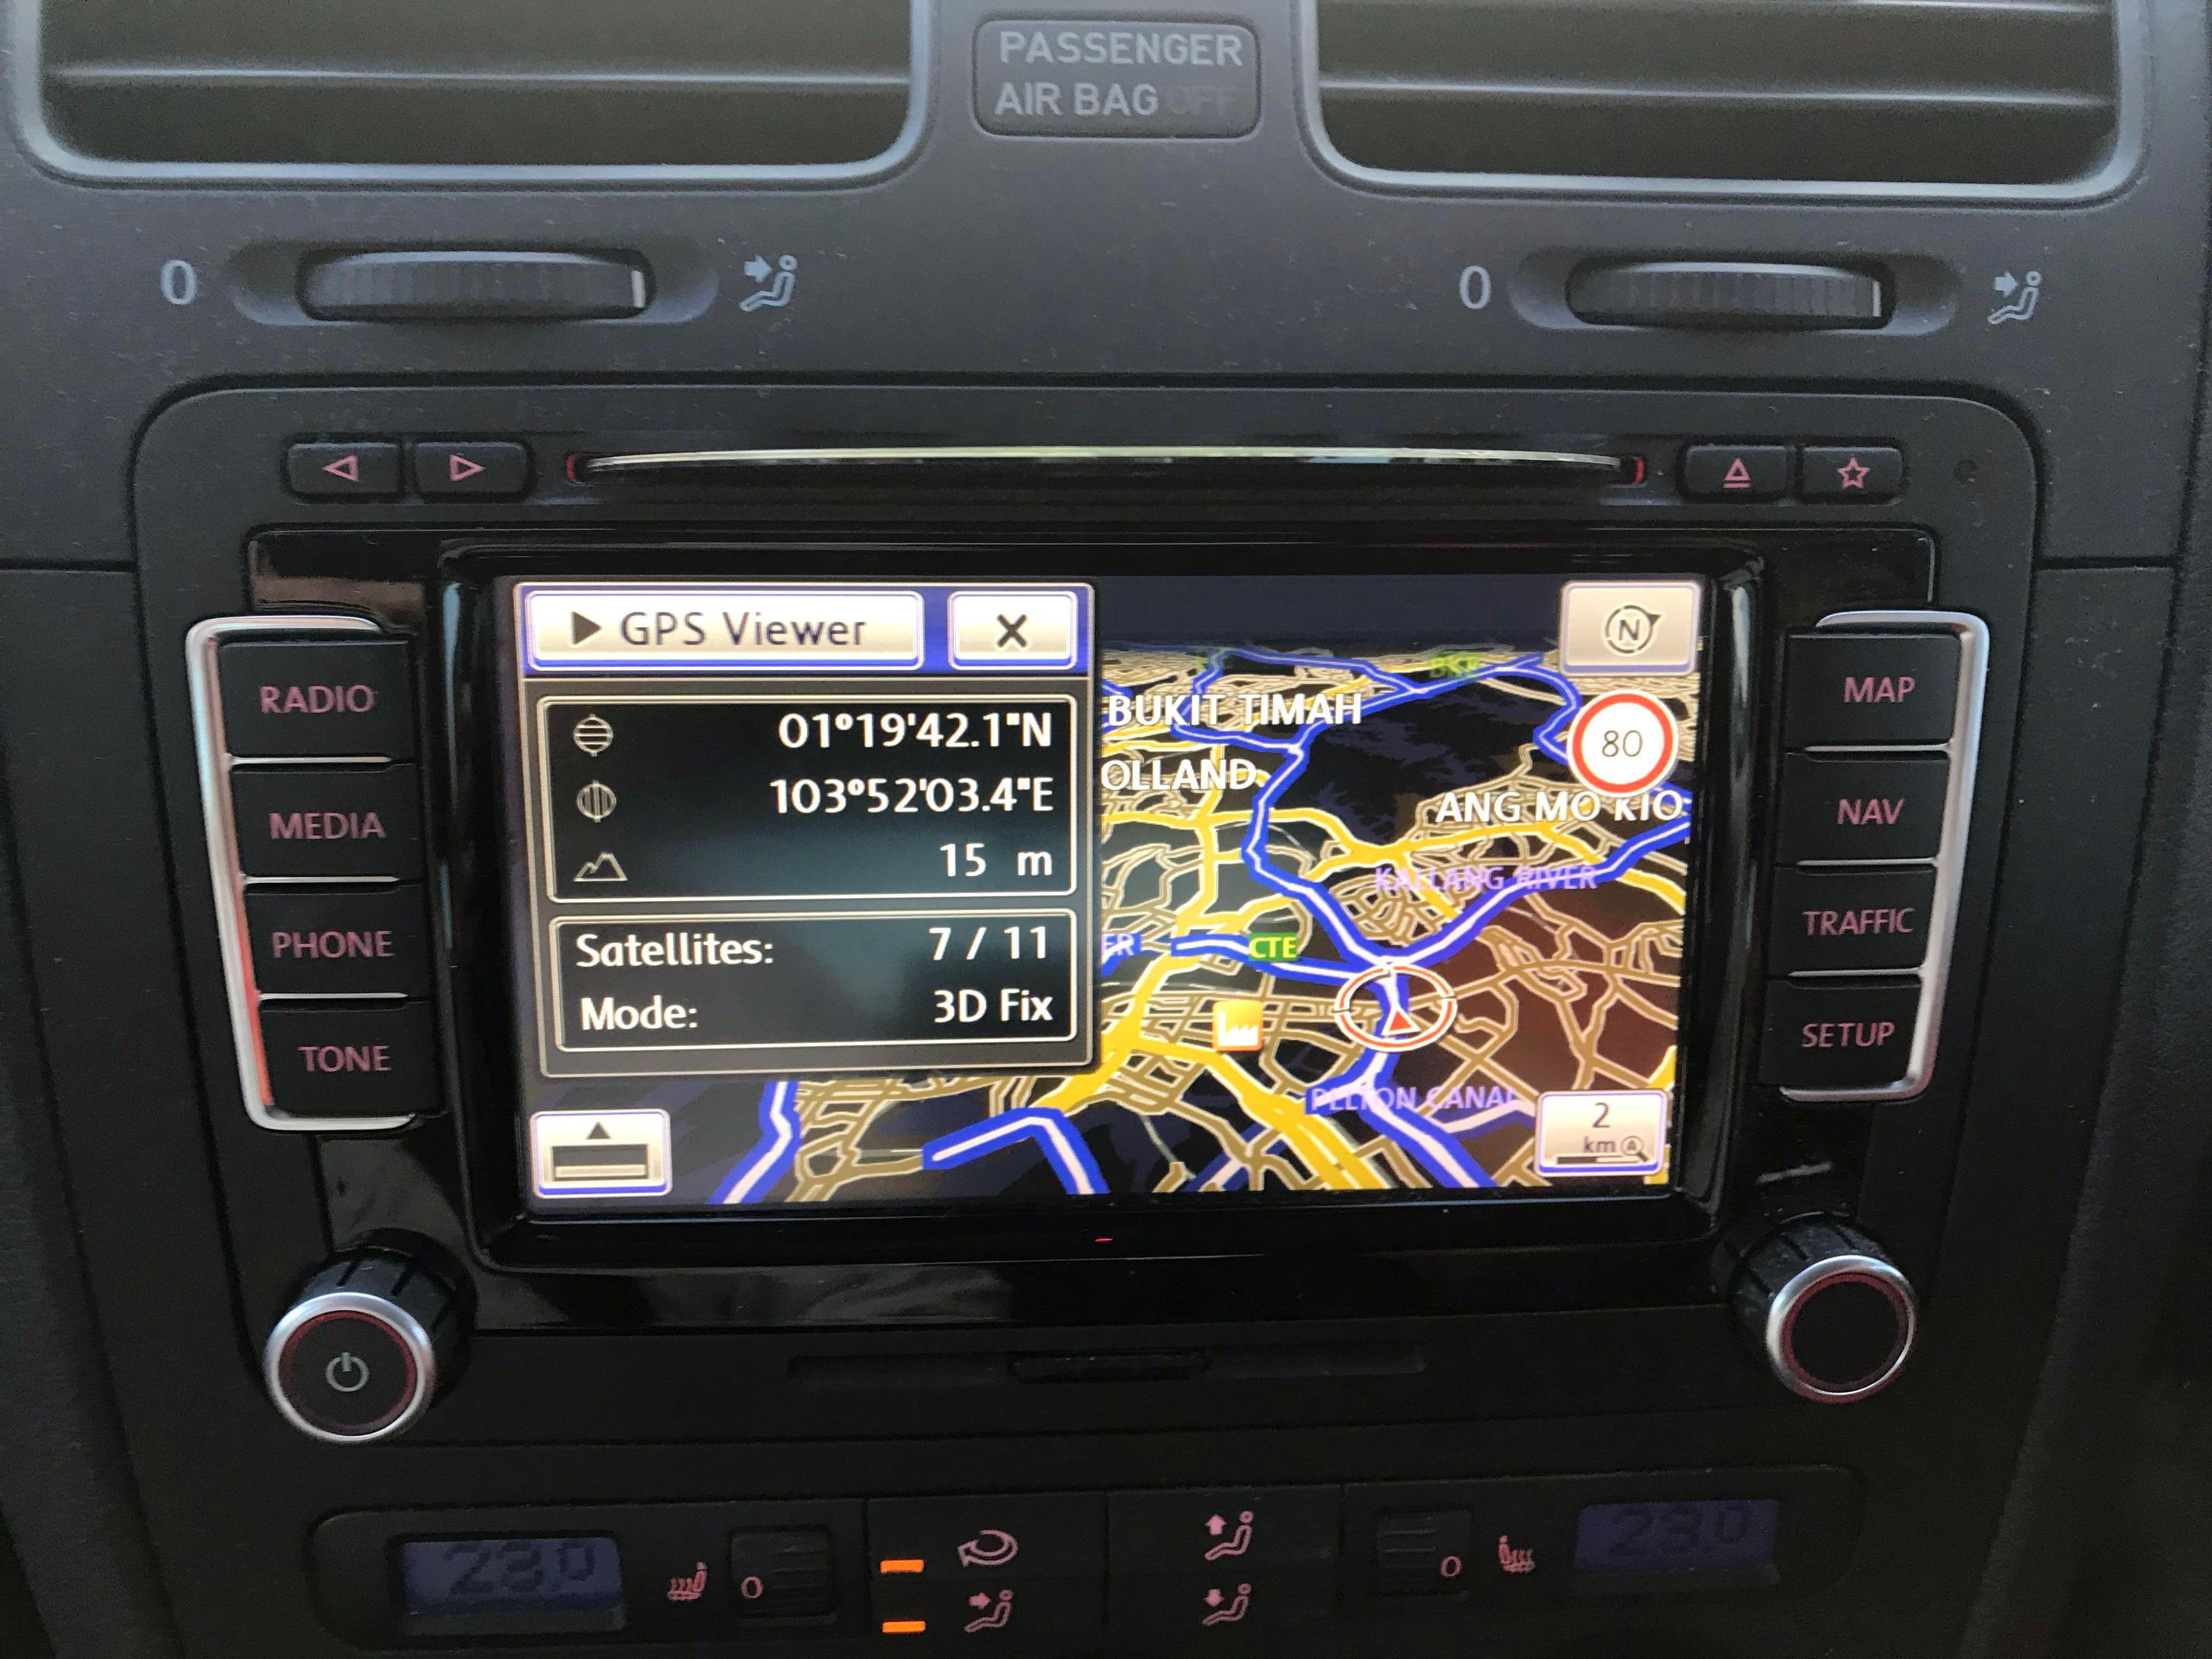 Volkswagen RNS-510 GPS DVD SDcard Entertainment Unit, Car